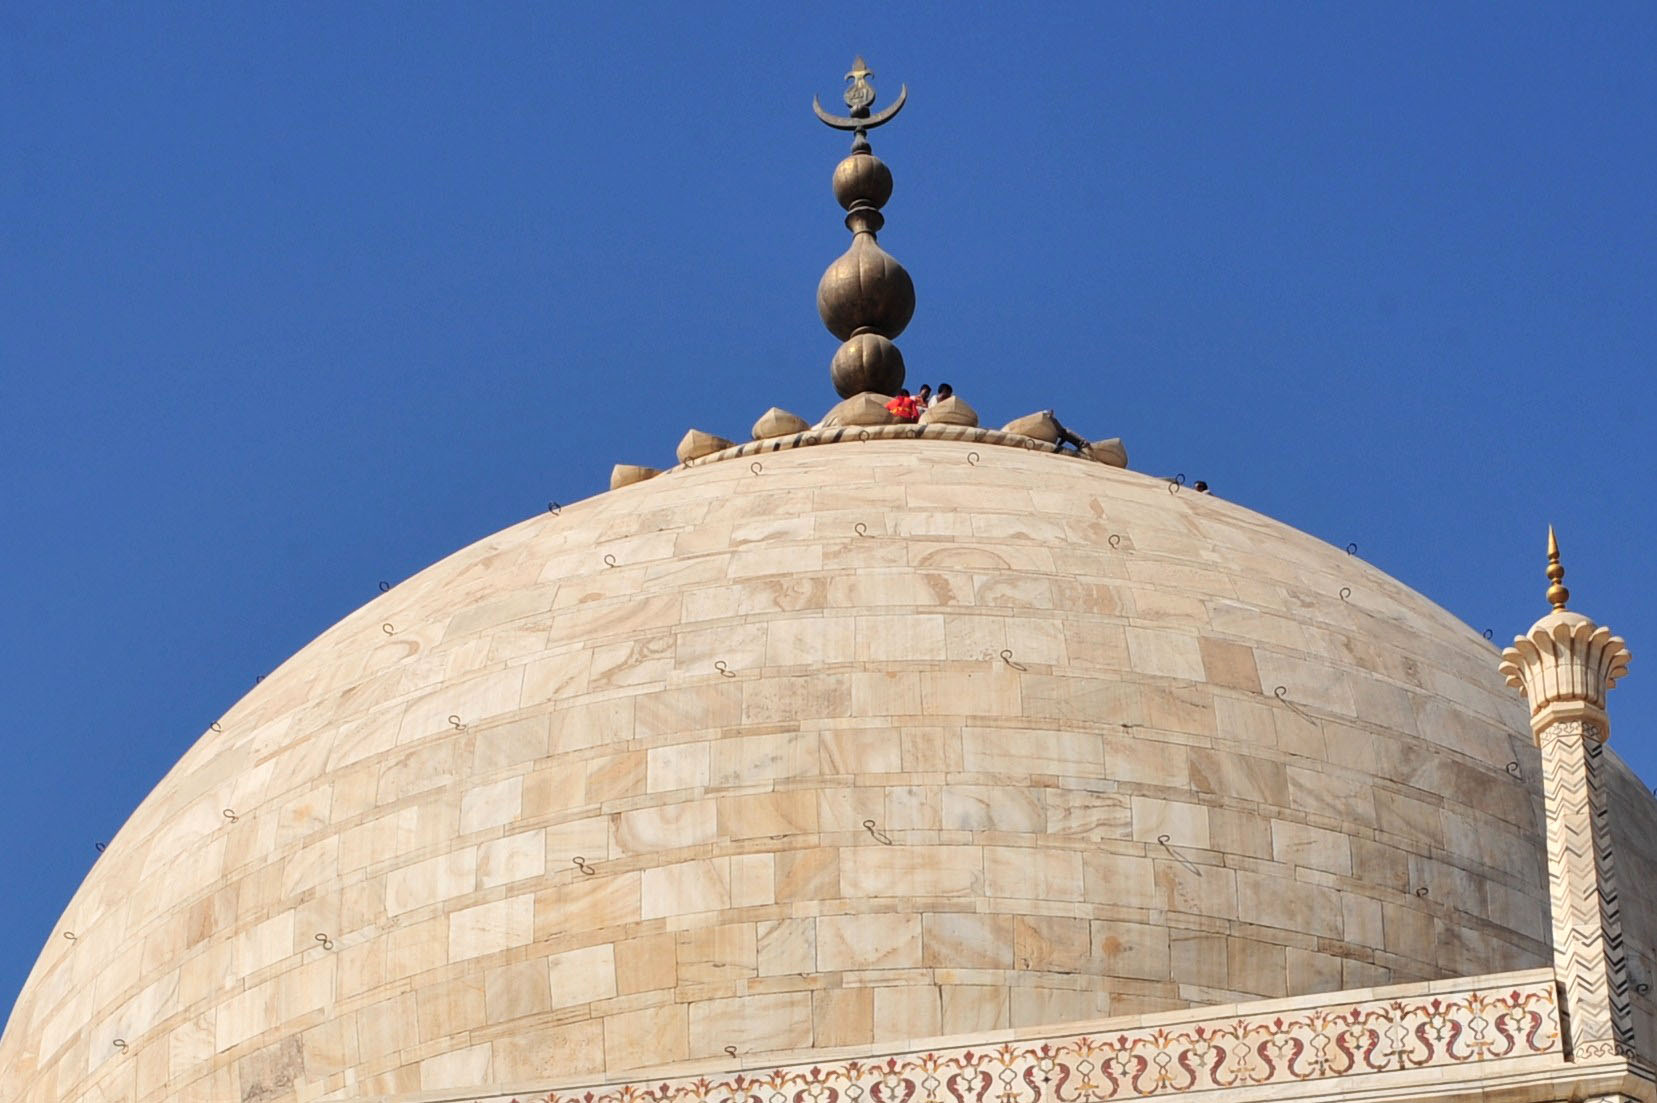 People on the roof of the Taj